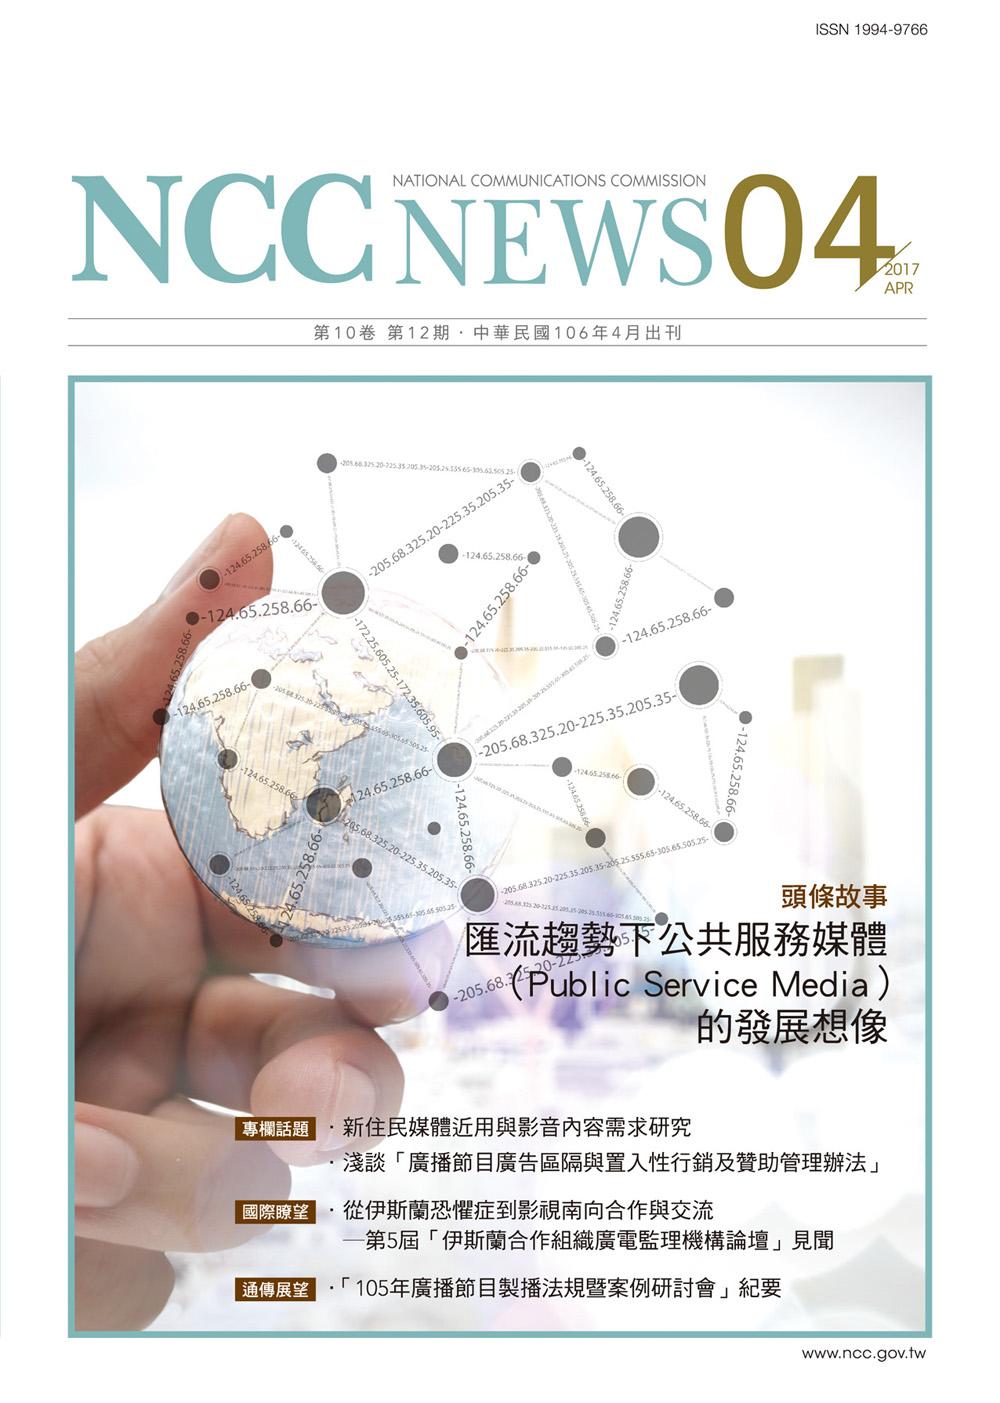 NCC NEWS 月刊106年4月號